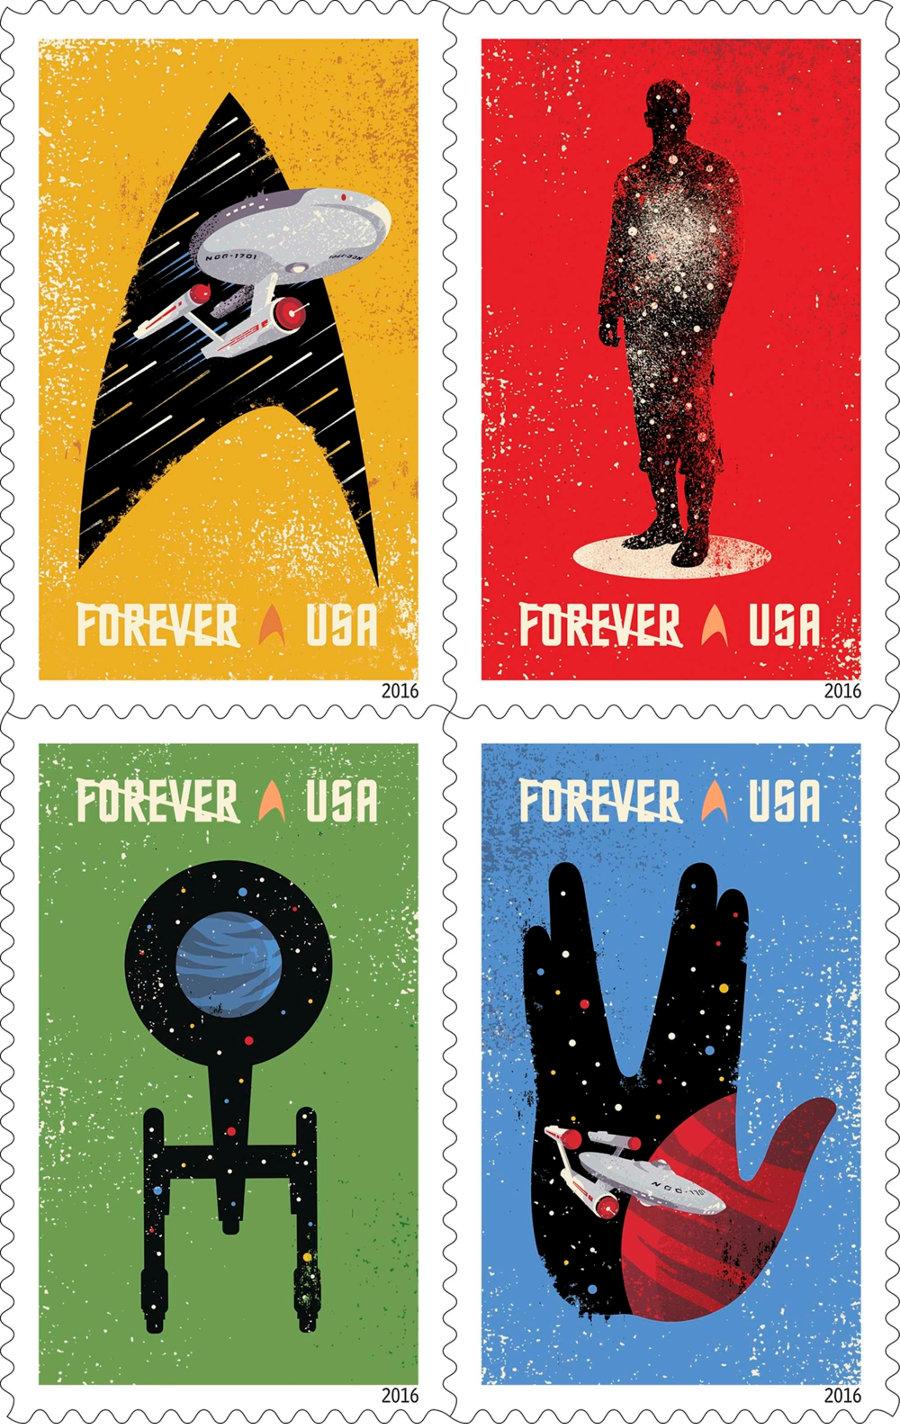 Star Trek francobolli